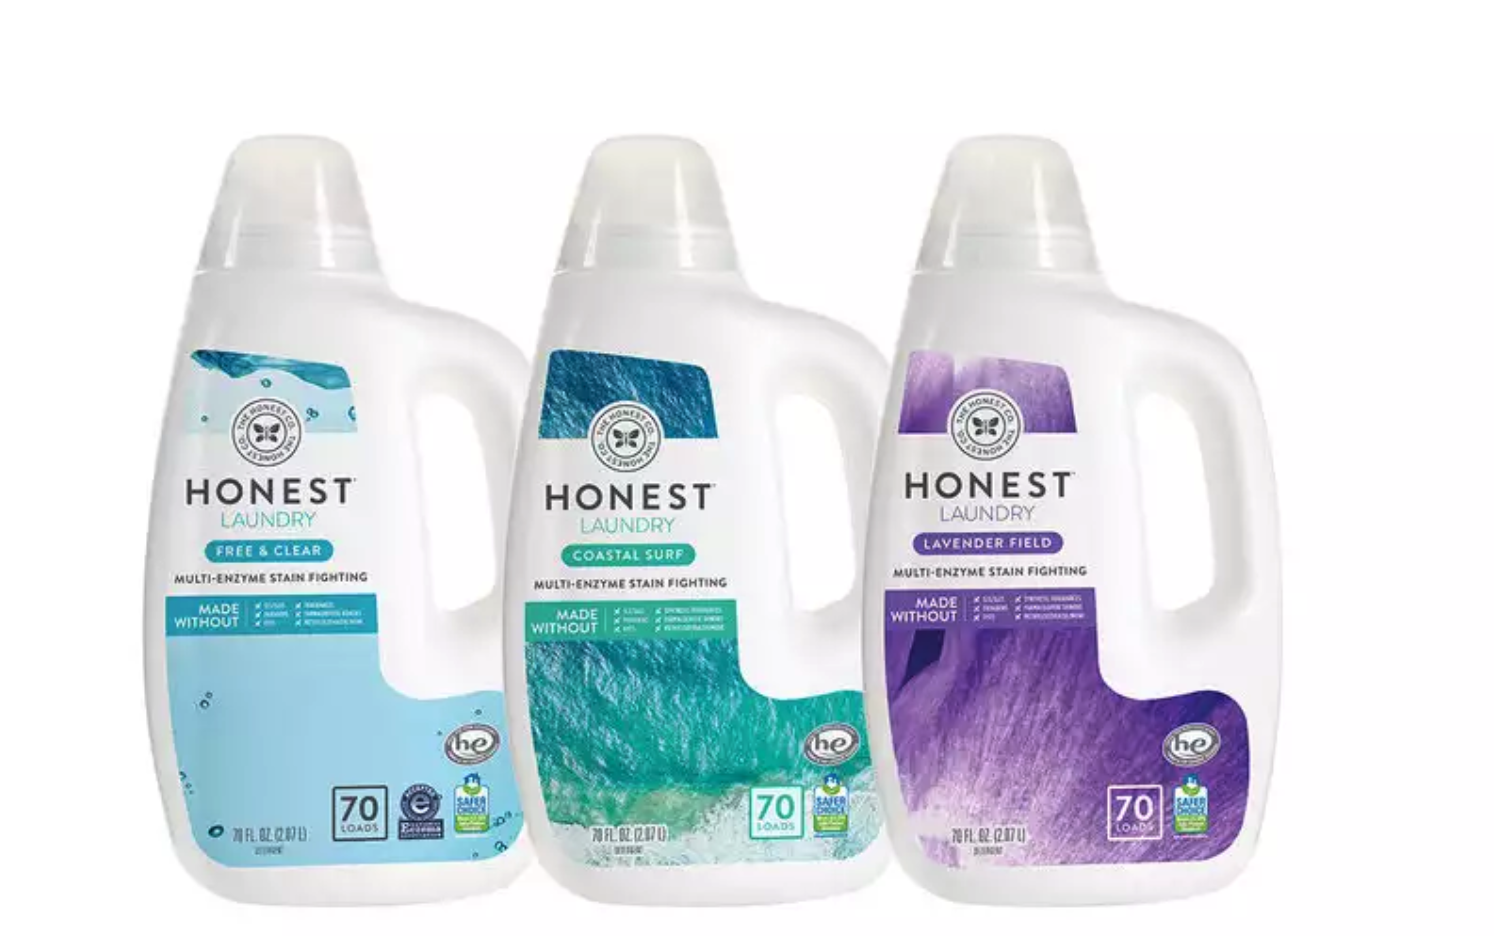 The Honest Company Laundry Detergent Laundry Detergent